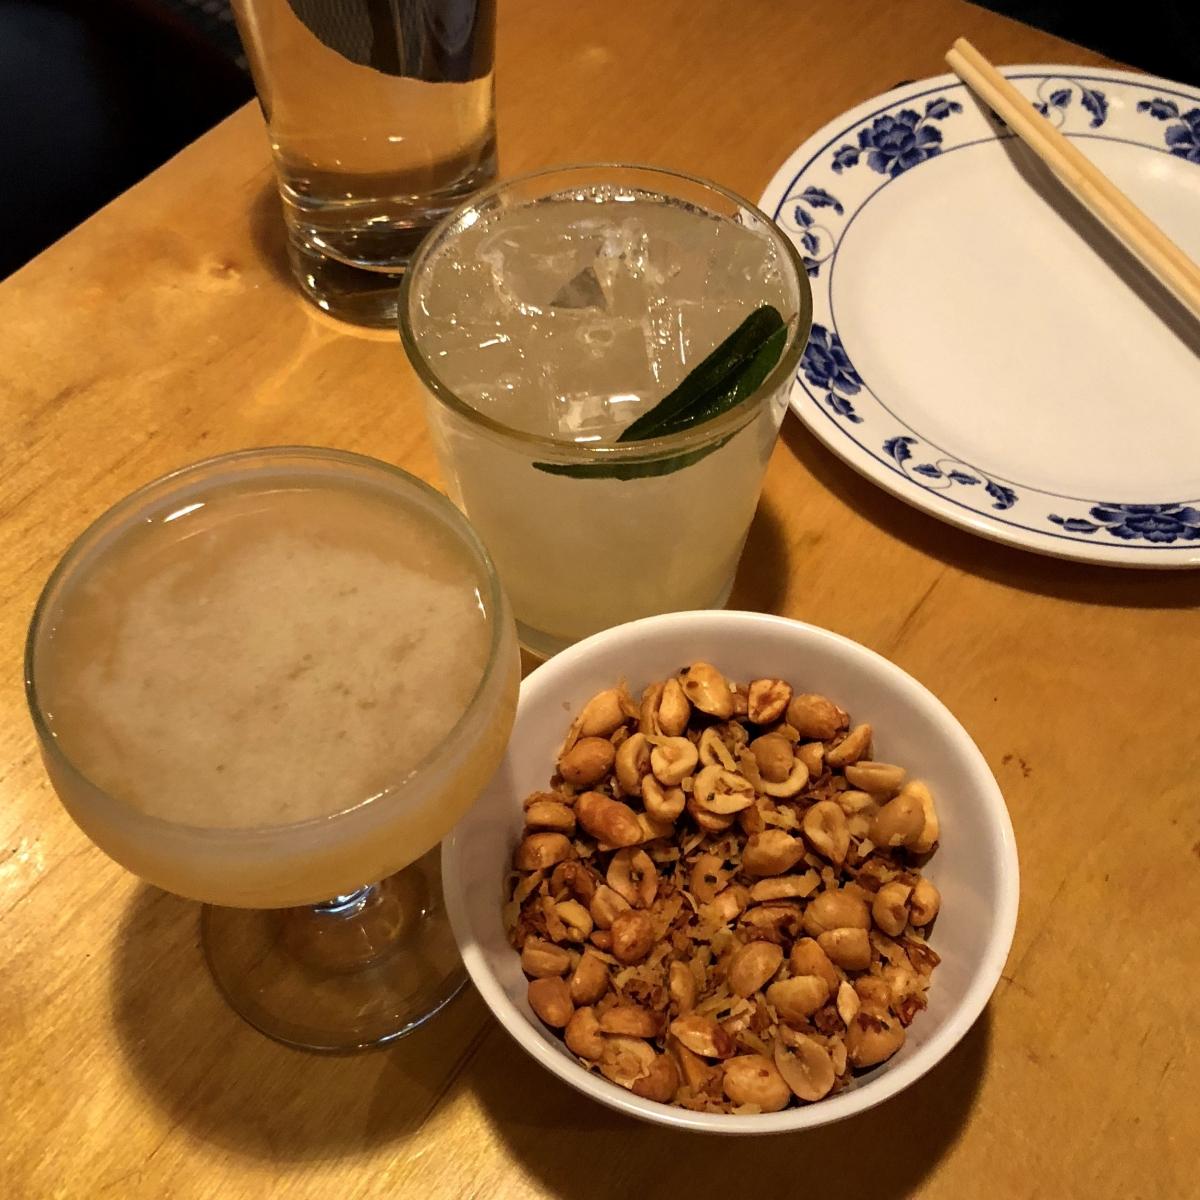 pig and khao peanuts baboy daiquiri rum & hyde